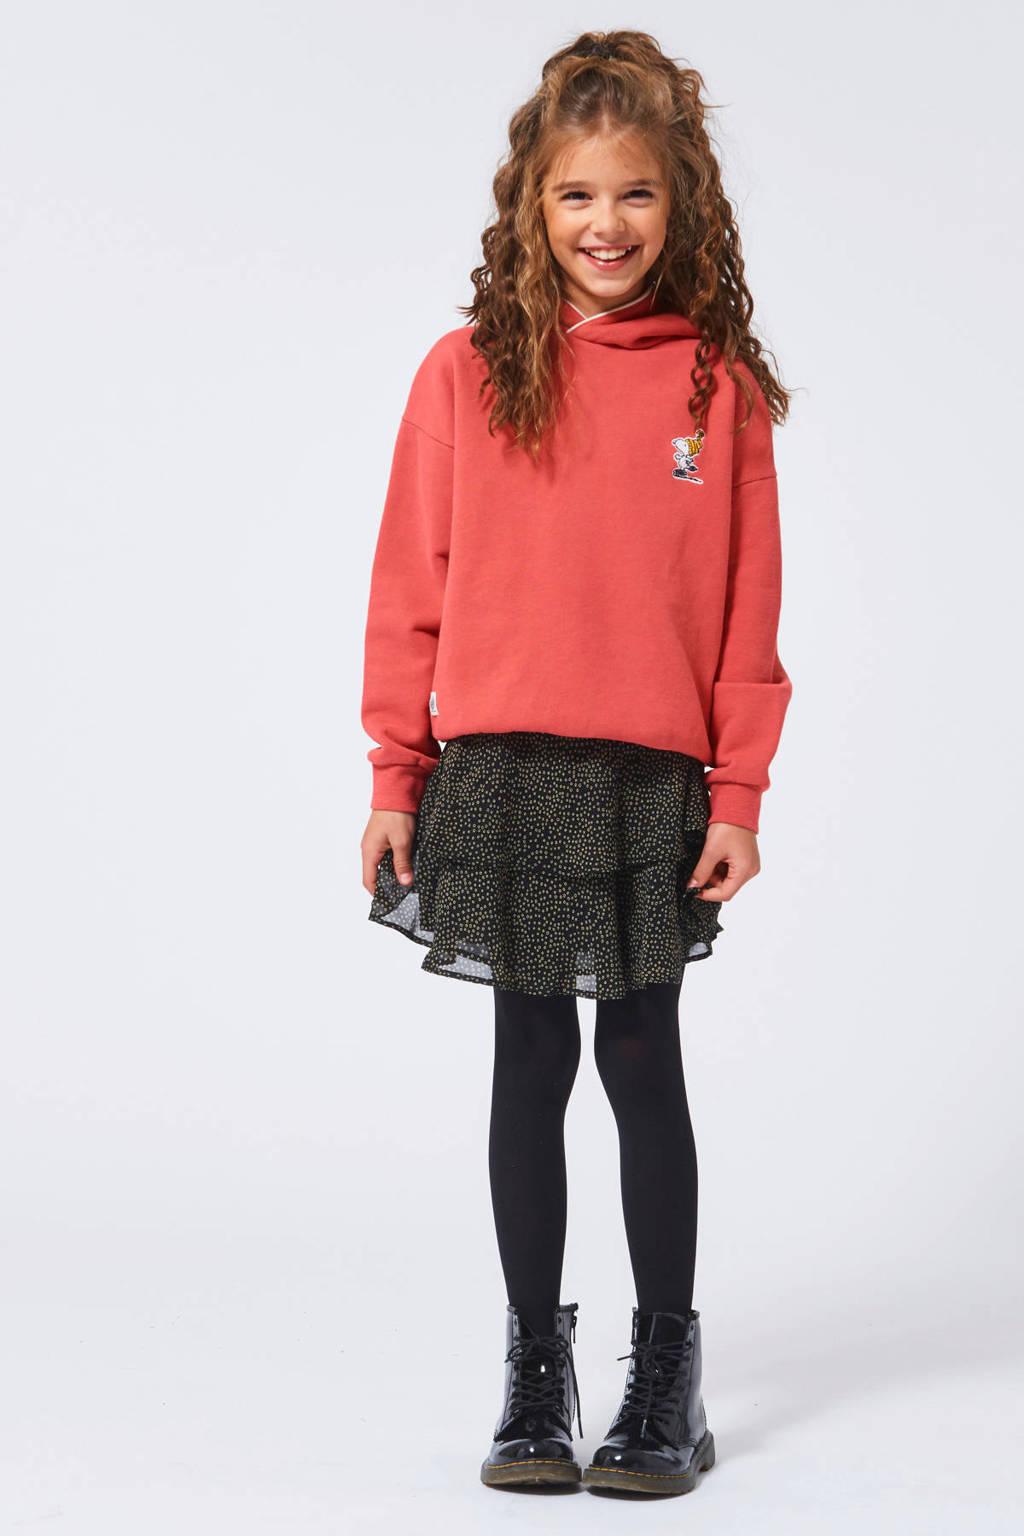 America Today Junior rok Rosie met all over print en ruches zwart/goud, Zwart/goud